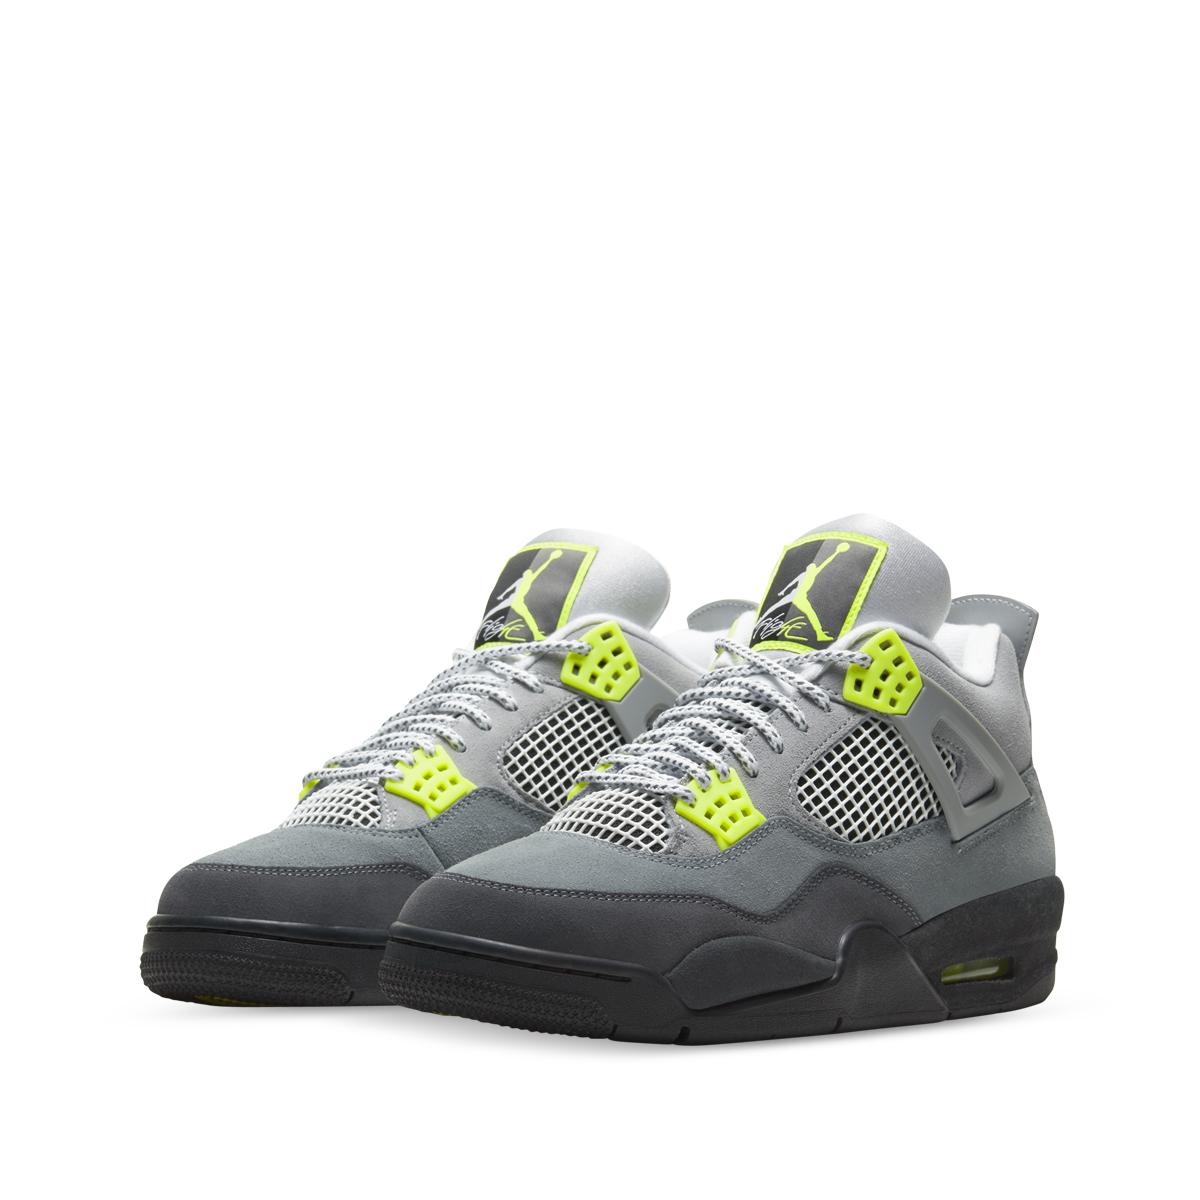 "Nike Air Jordan 4 Retro SE ""Neon"""